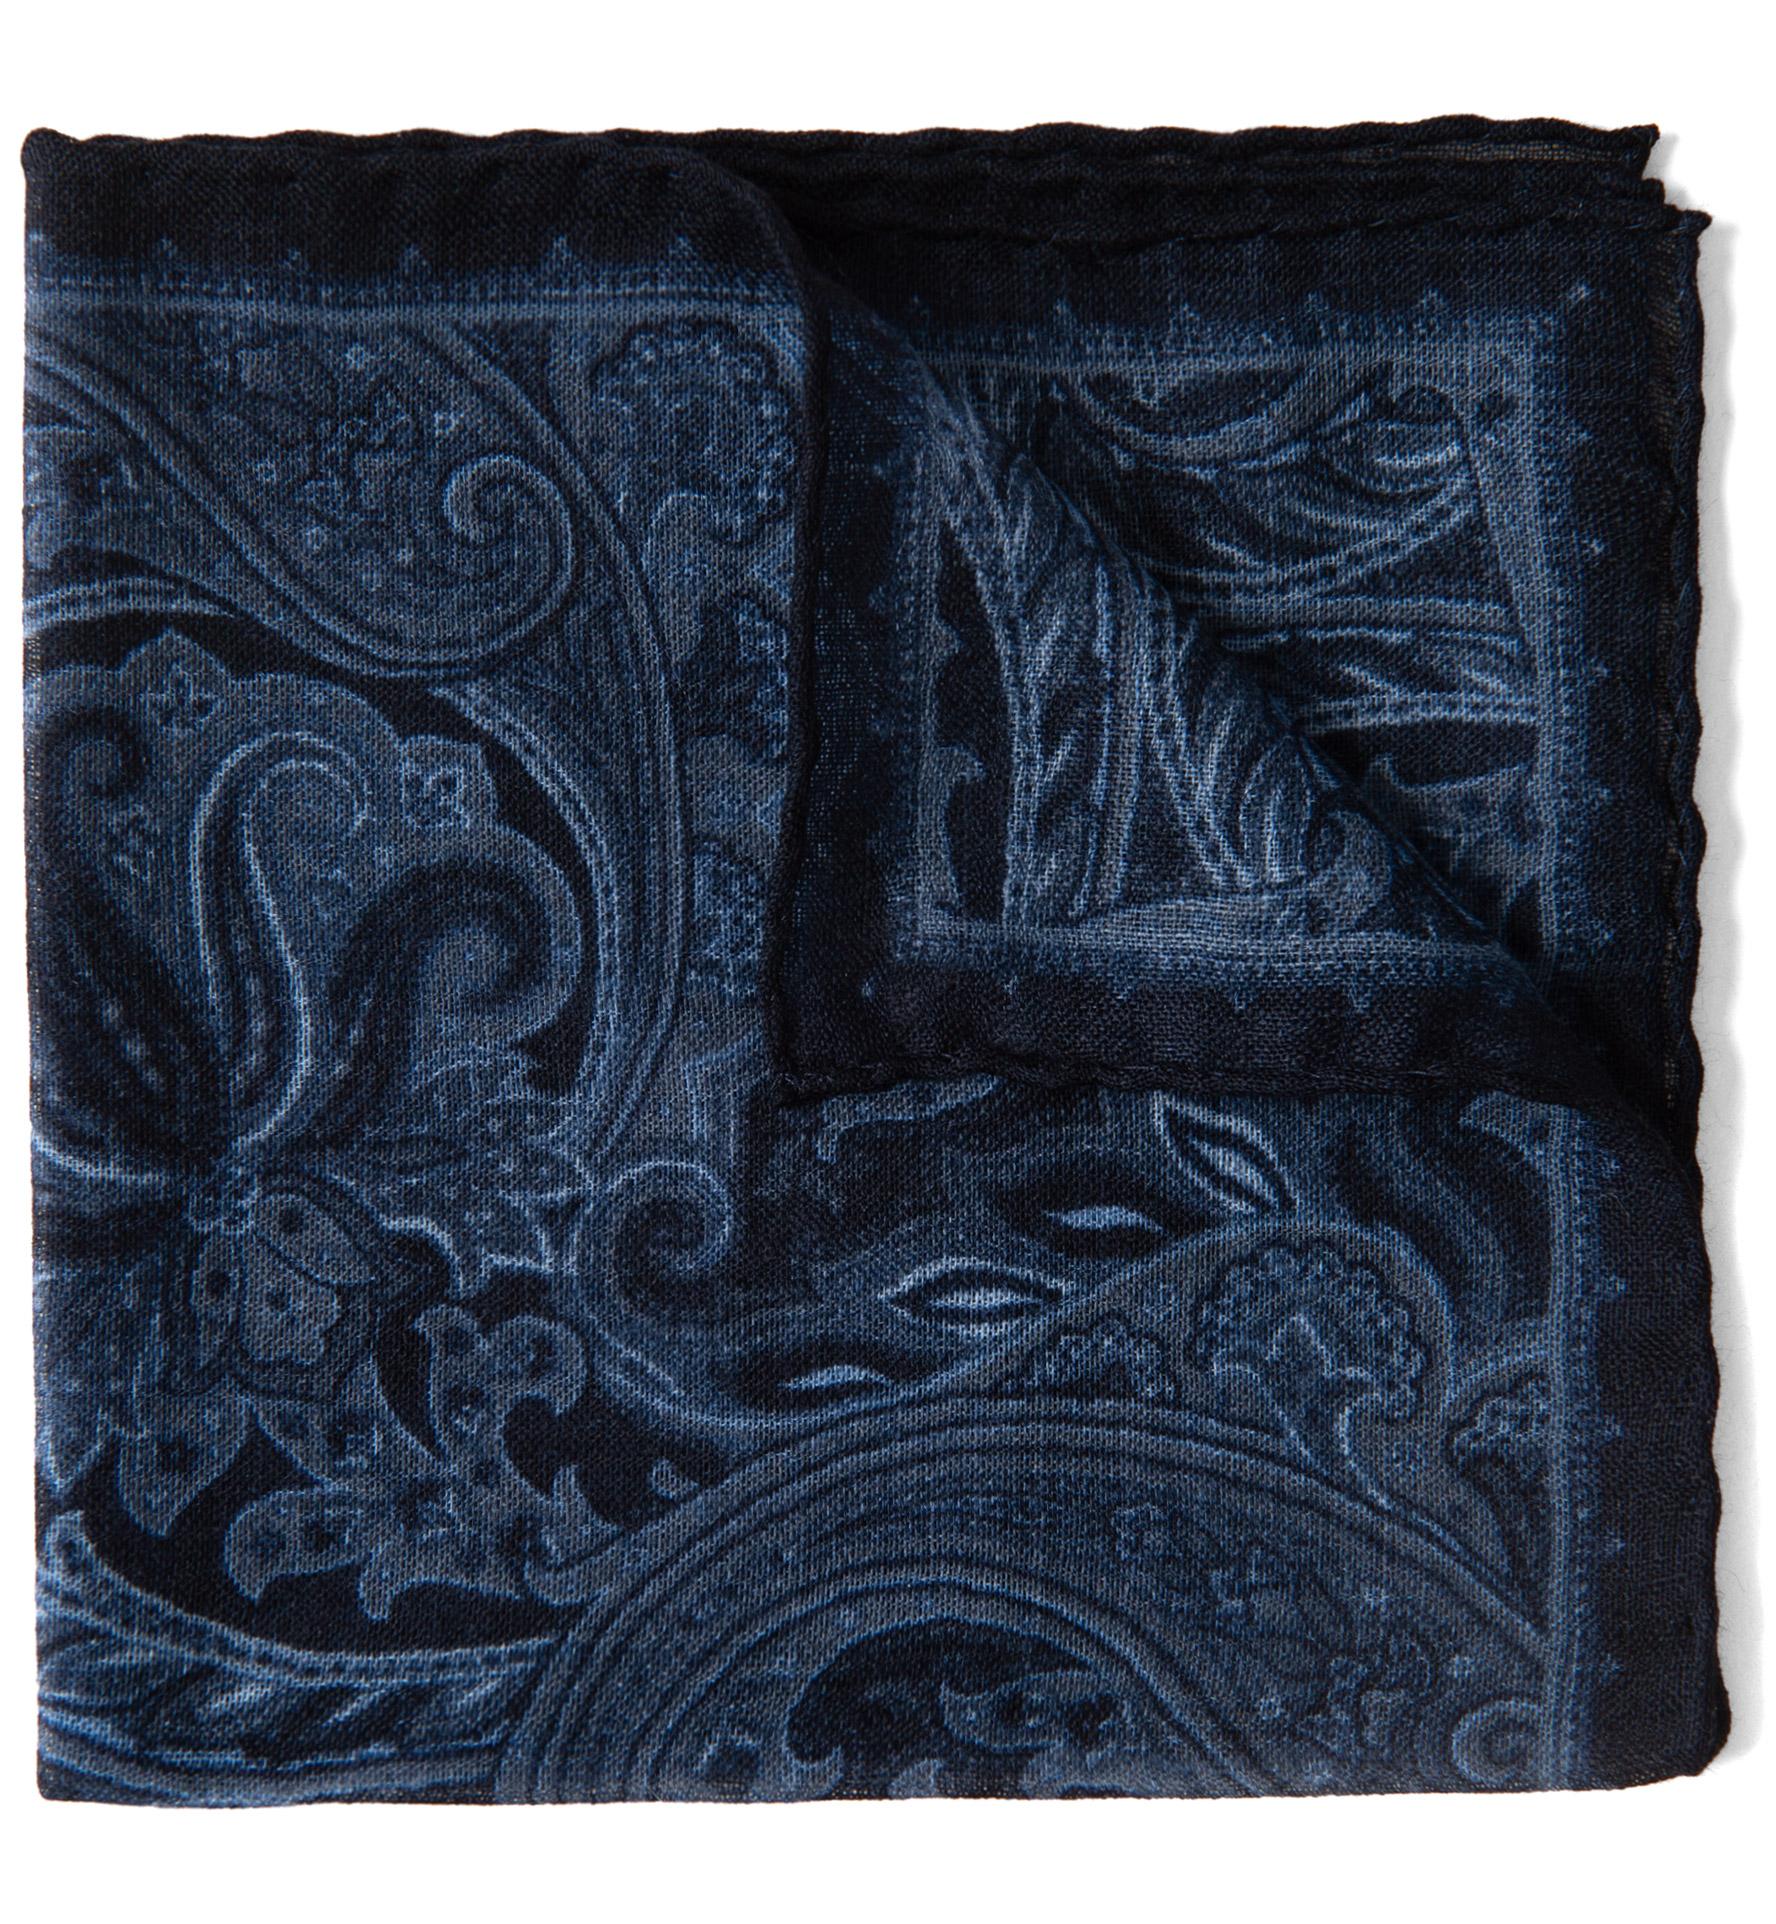 Zoom Image of Navy Paisley Gauze Wool Pocket Square